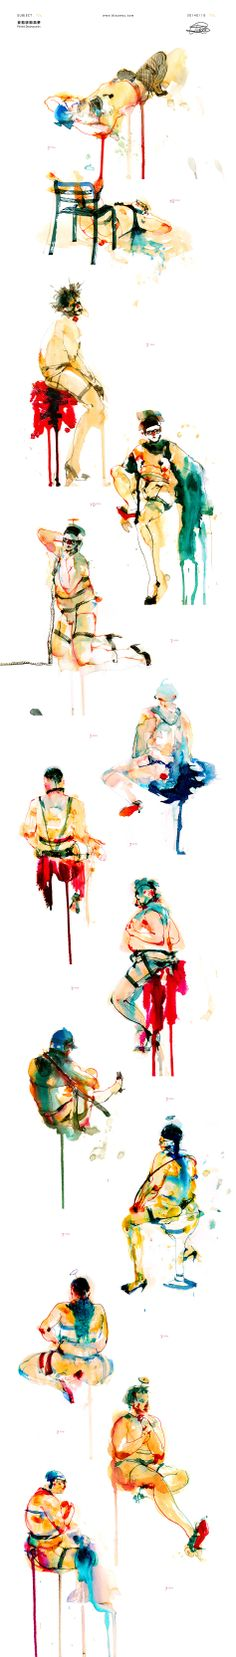 | 20140115 in 蛙蛙漫吧 | Subject:変態哆啦茄夢 Pervert Doranasumon / Illustration by Blaze Wu. / Model's photo:http://imgur.com/3TZubgg.jpg / photographed by 林小黃